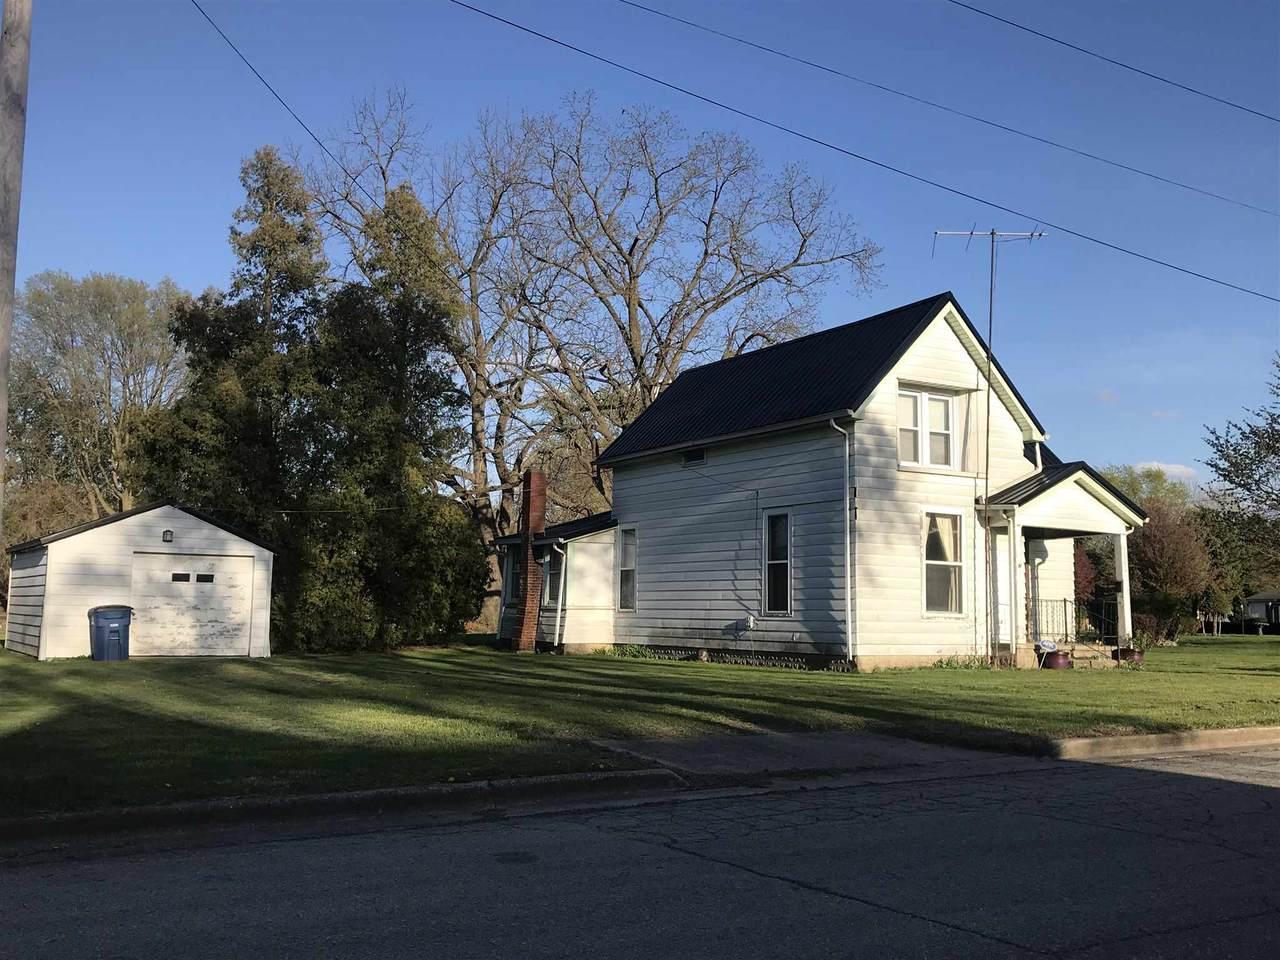 3125 Mcclure Street - Photo 1